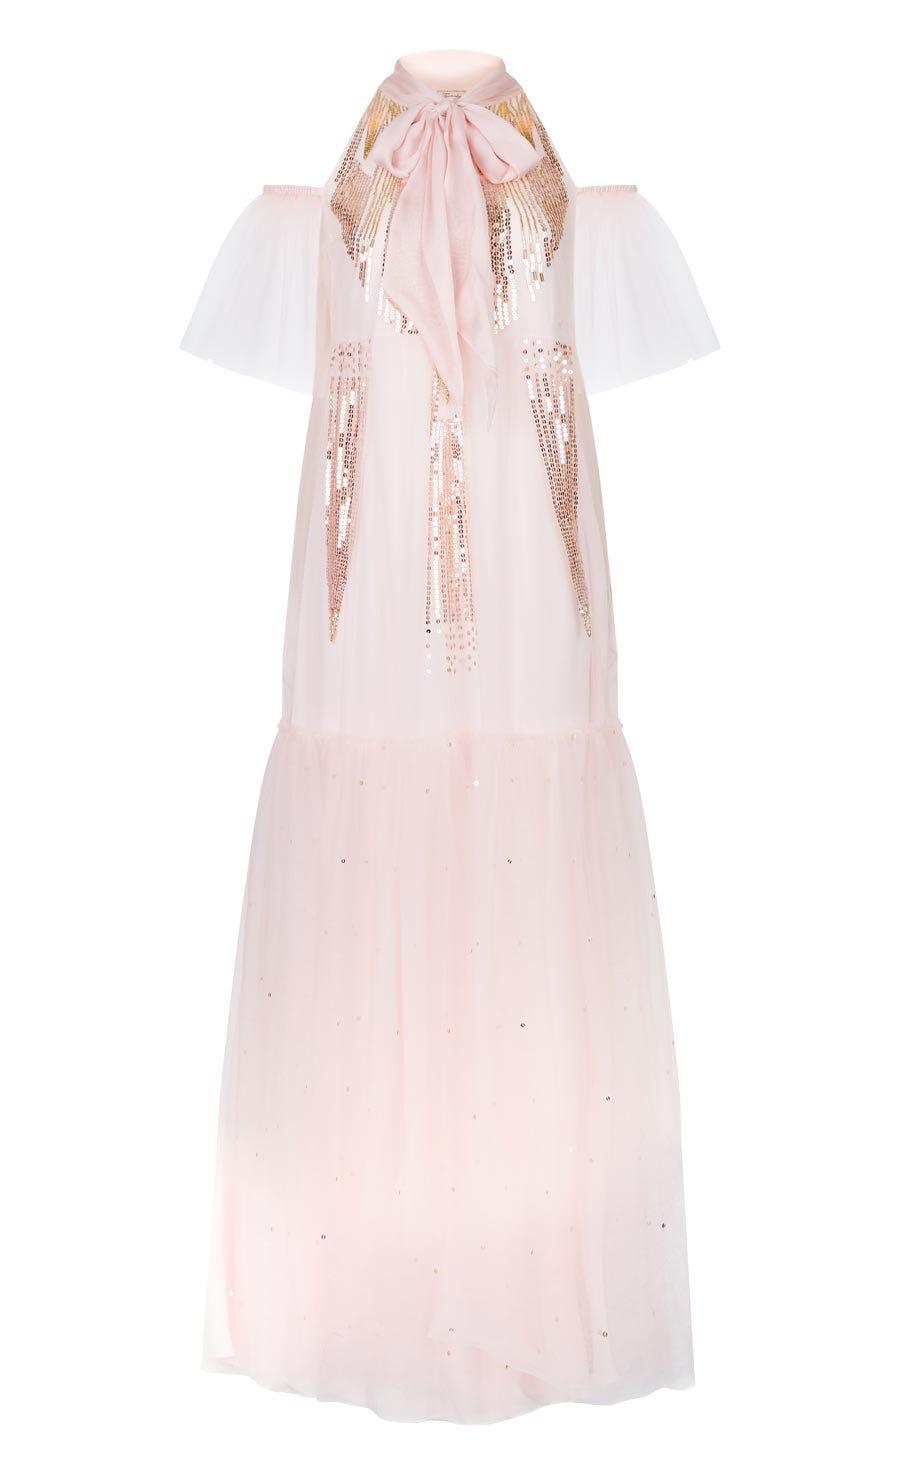 Mineral Dress, Shell